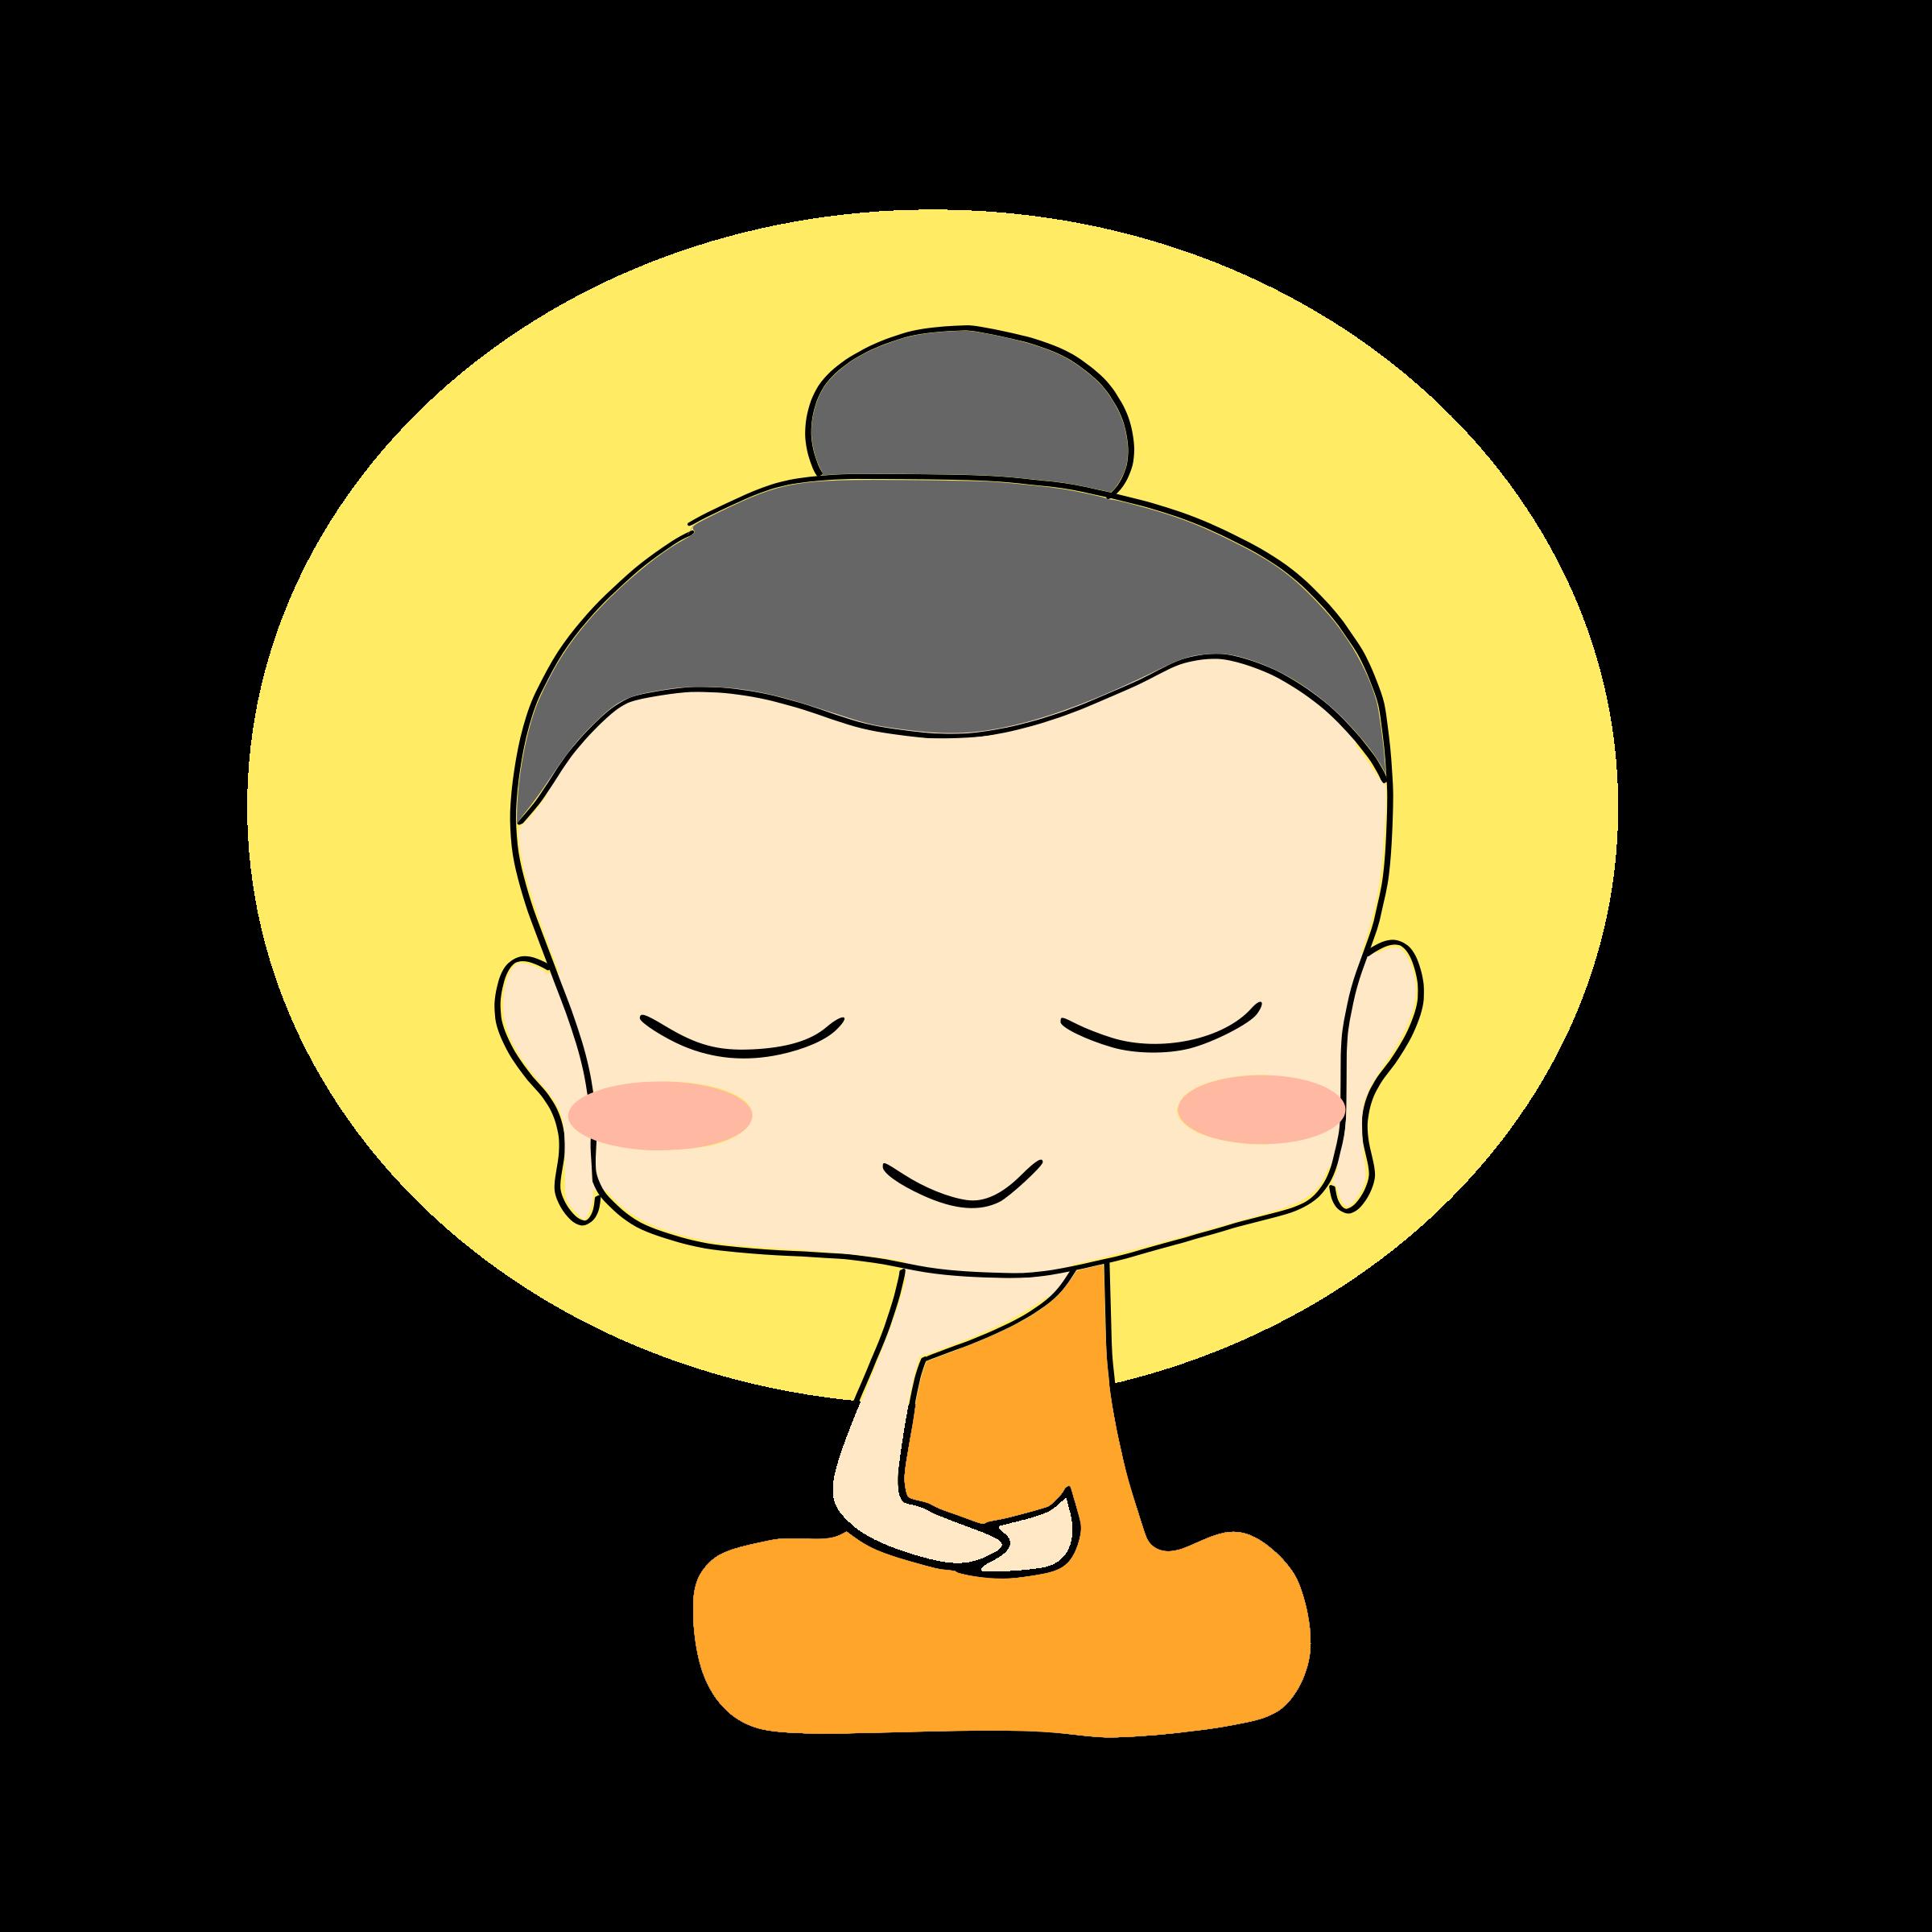 clipart freeuse library Chibi. Cute buddha clipart.